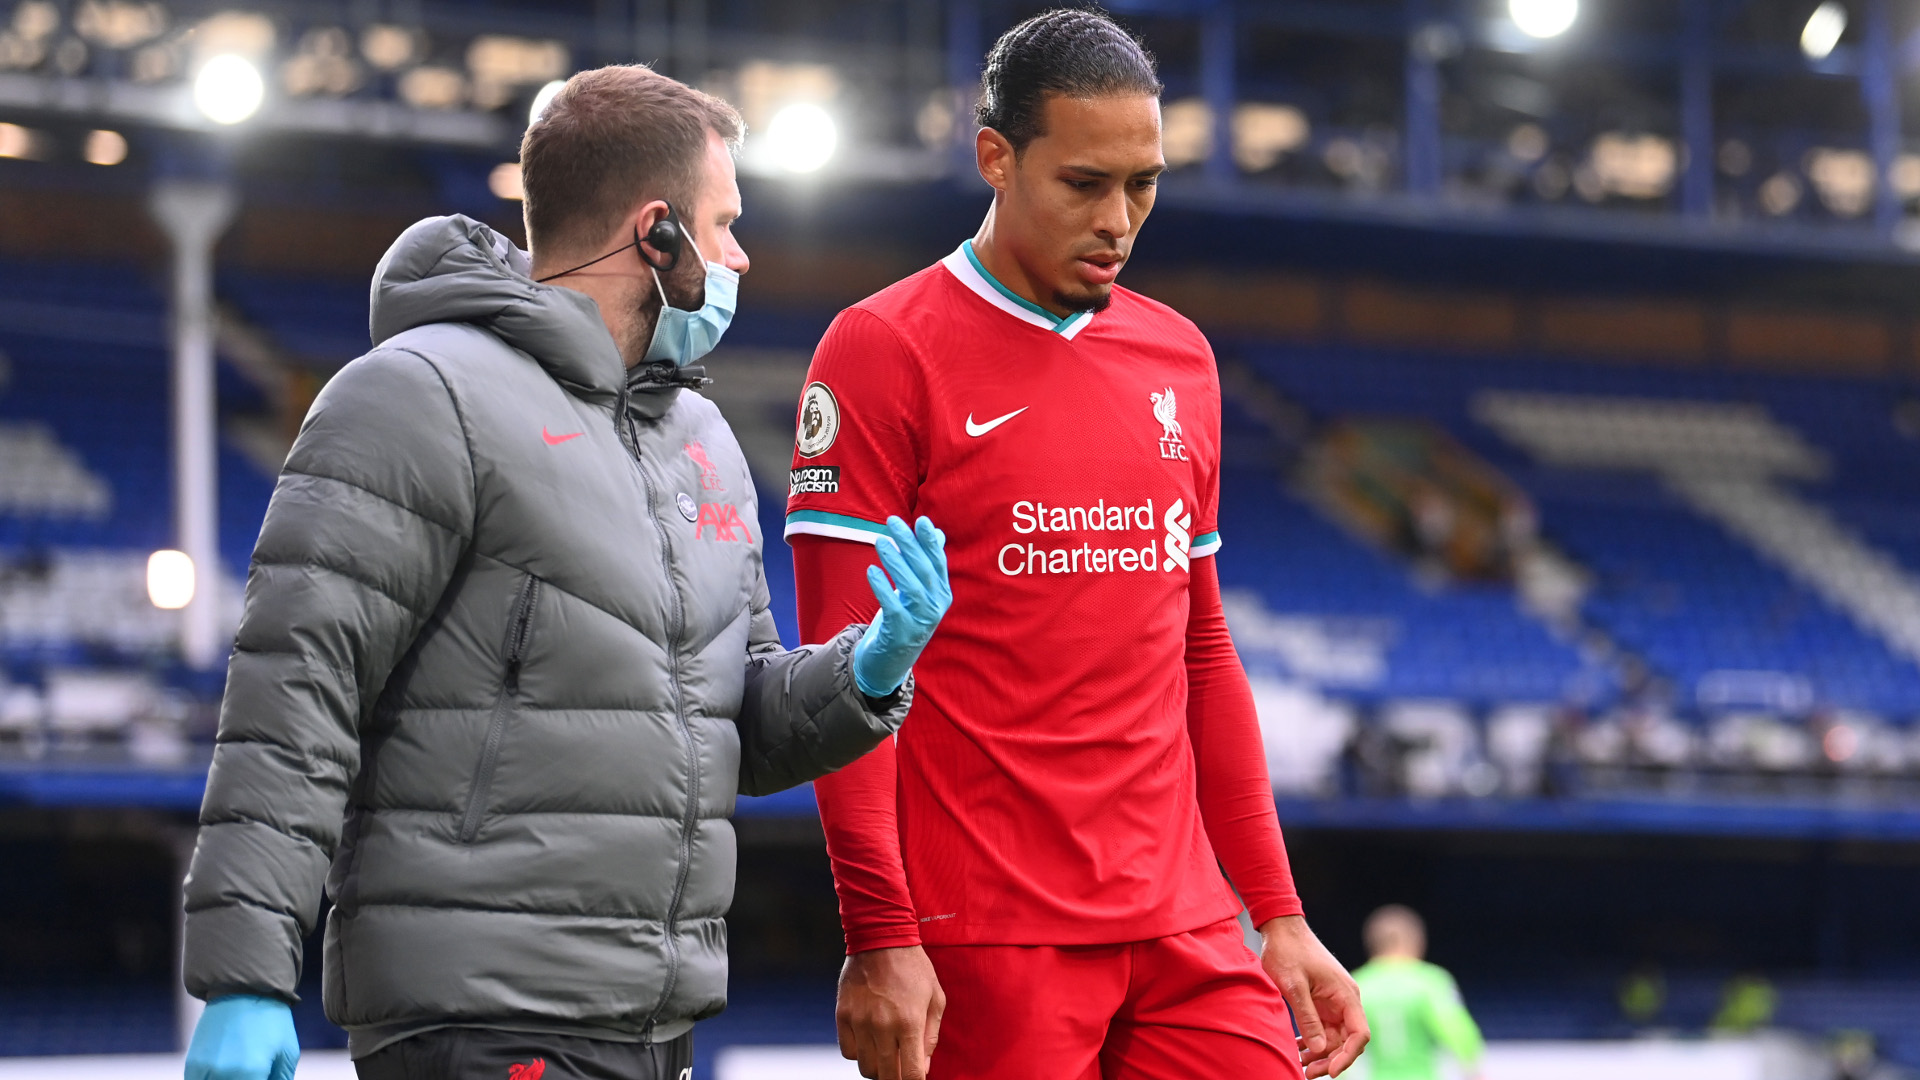 Liverpool boss Klopp offers Van Dijk recovery update after encouraging training videos